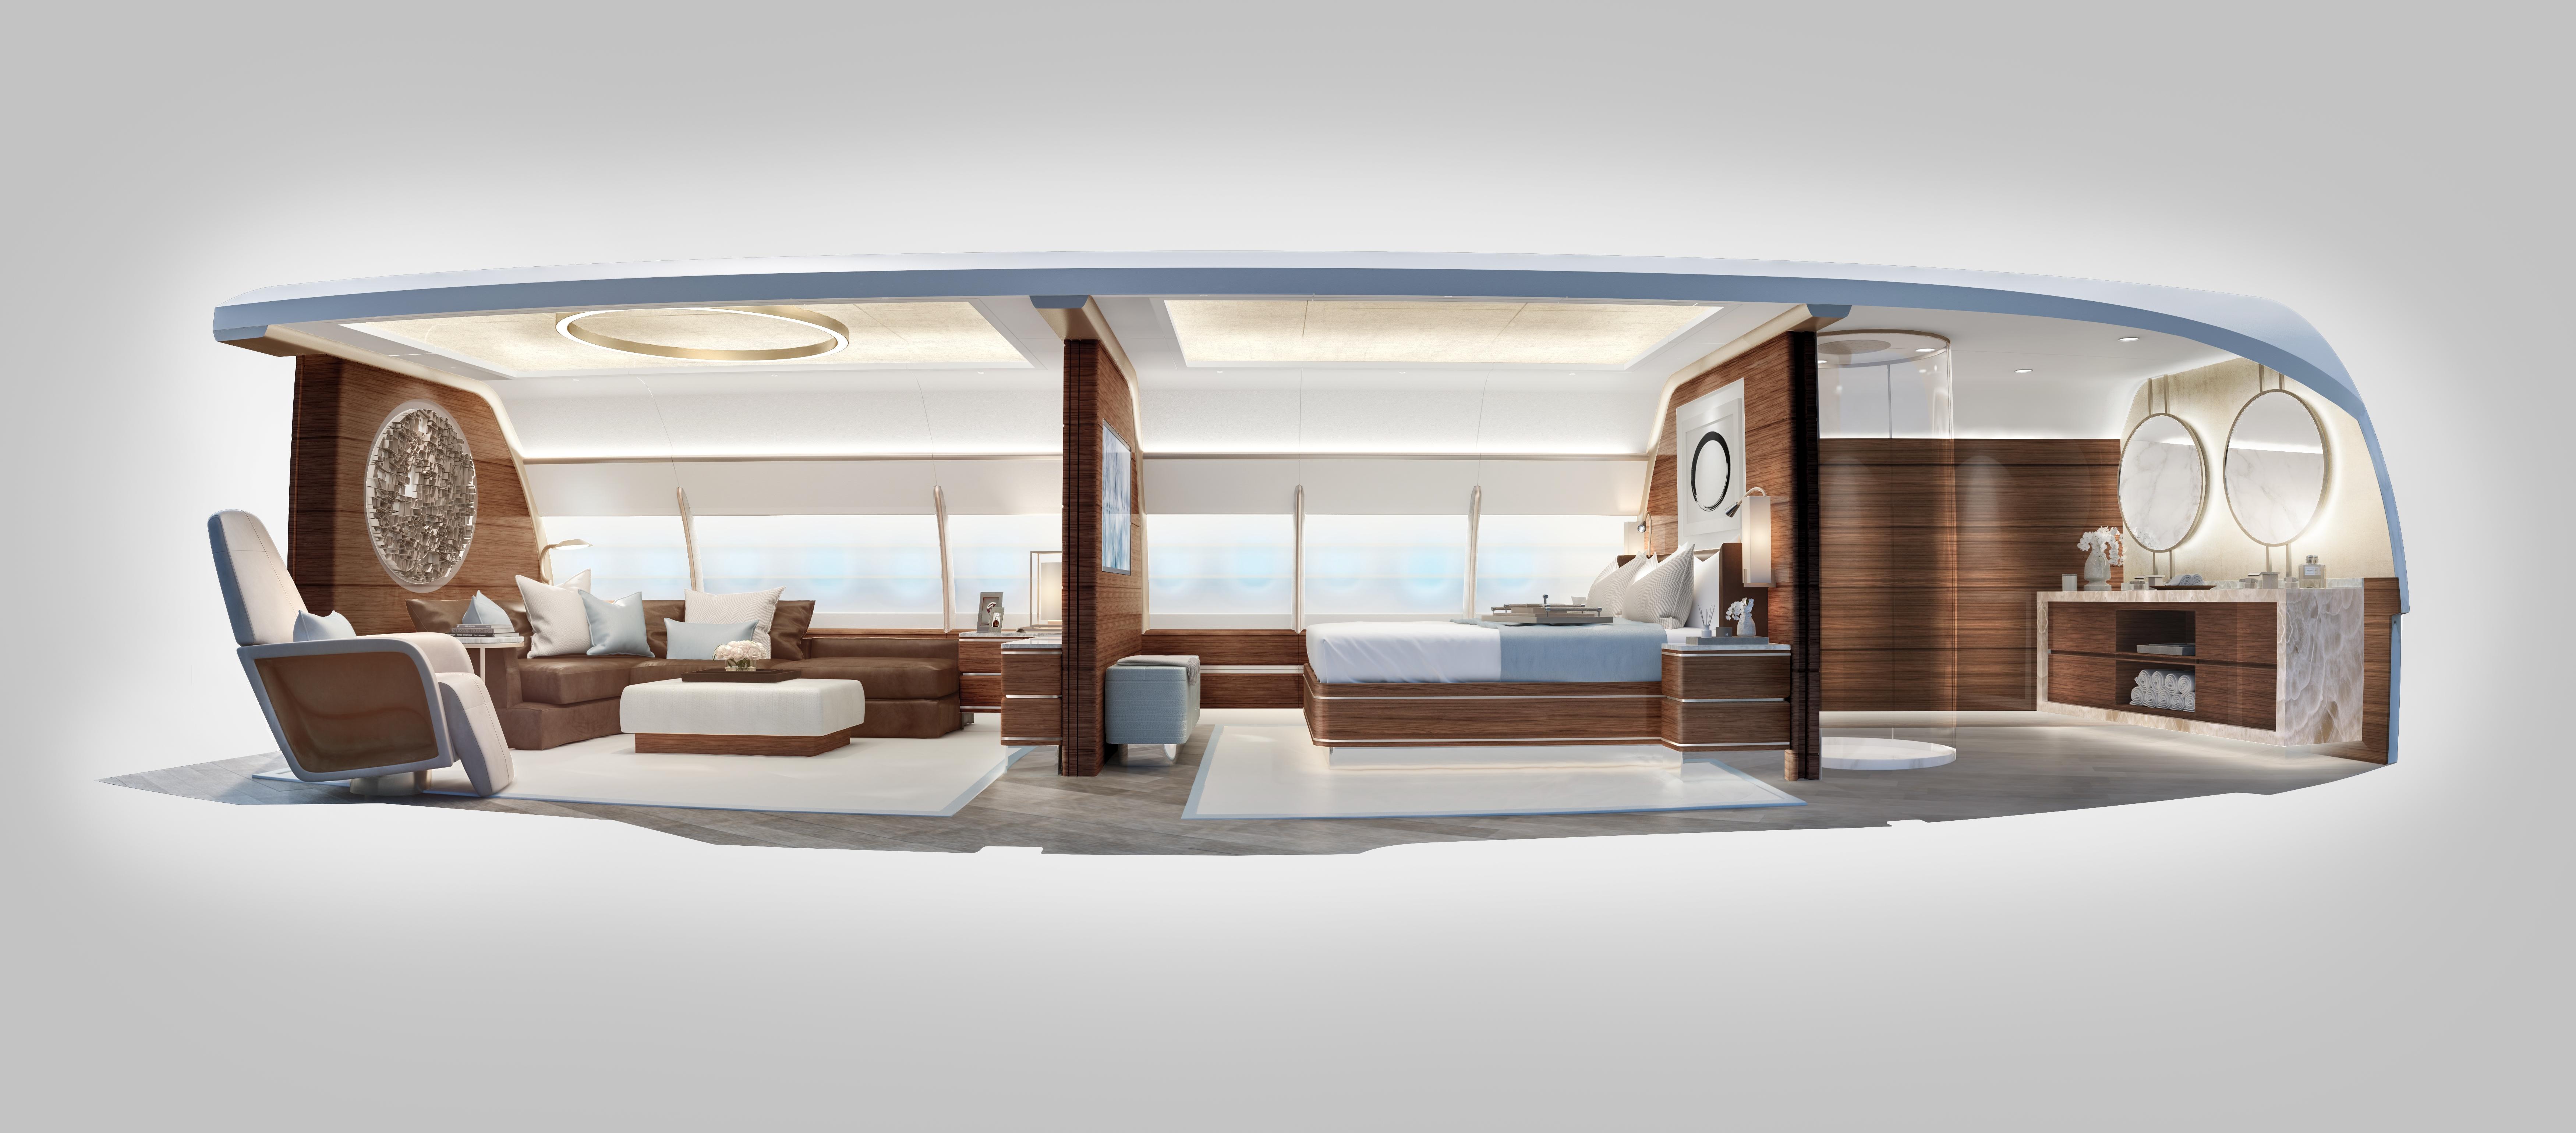 1221-17-04-27-Private-Suite-Homely-Light-Floor.jpg